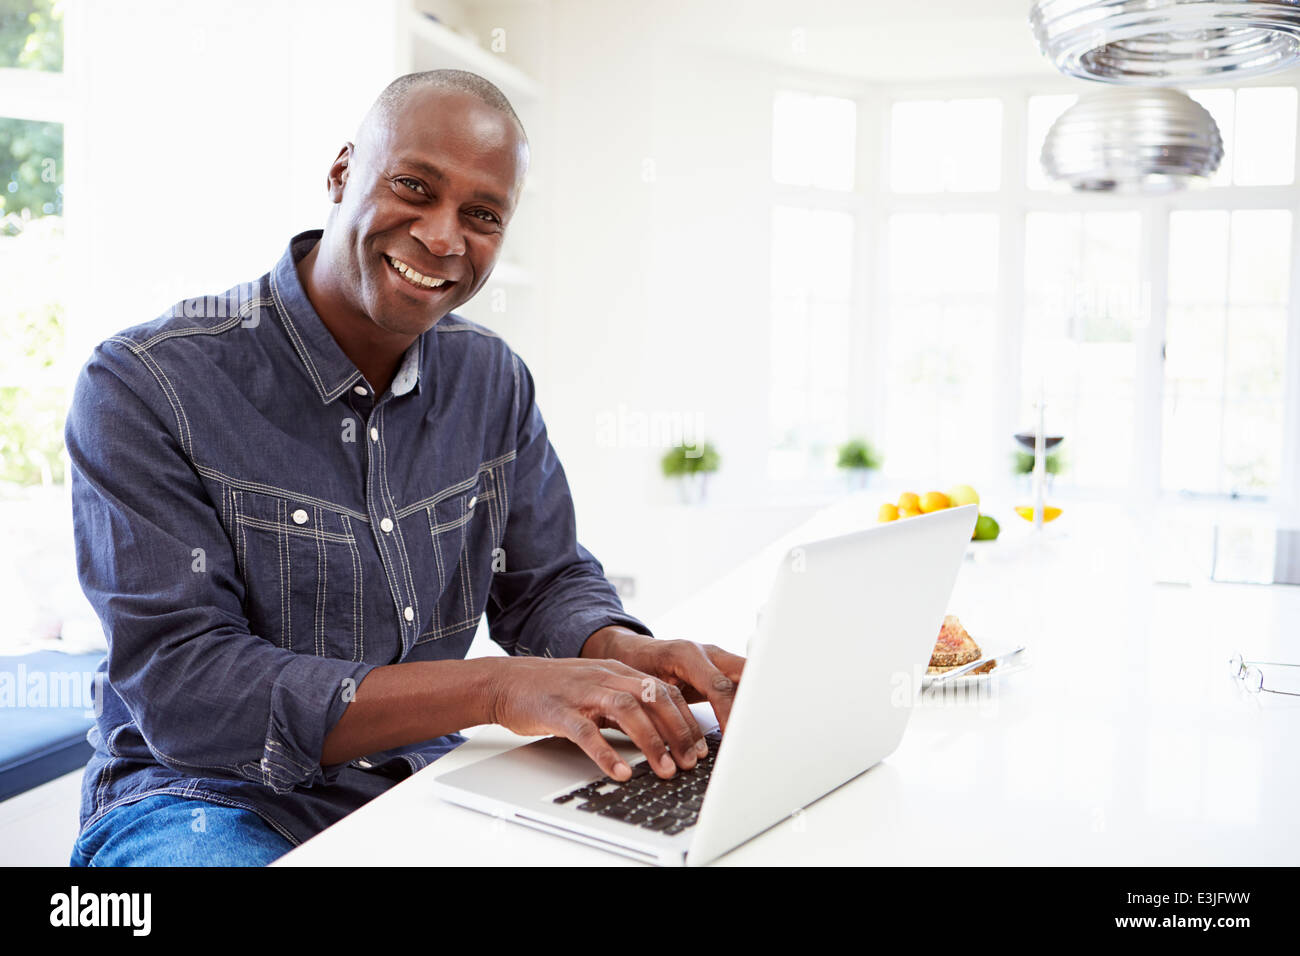 Hombre afroamericano utilizando equipo portátil en casa Imagen De Stock